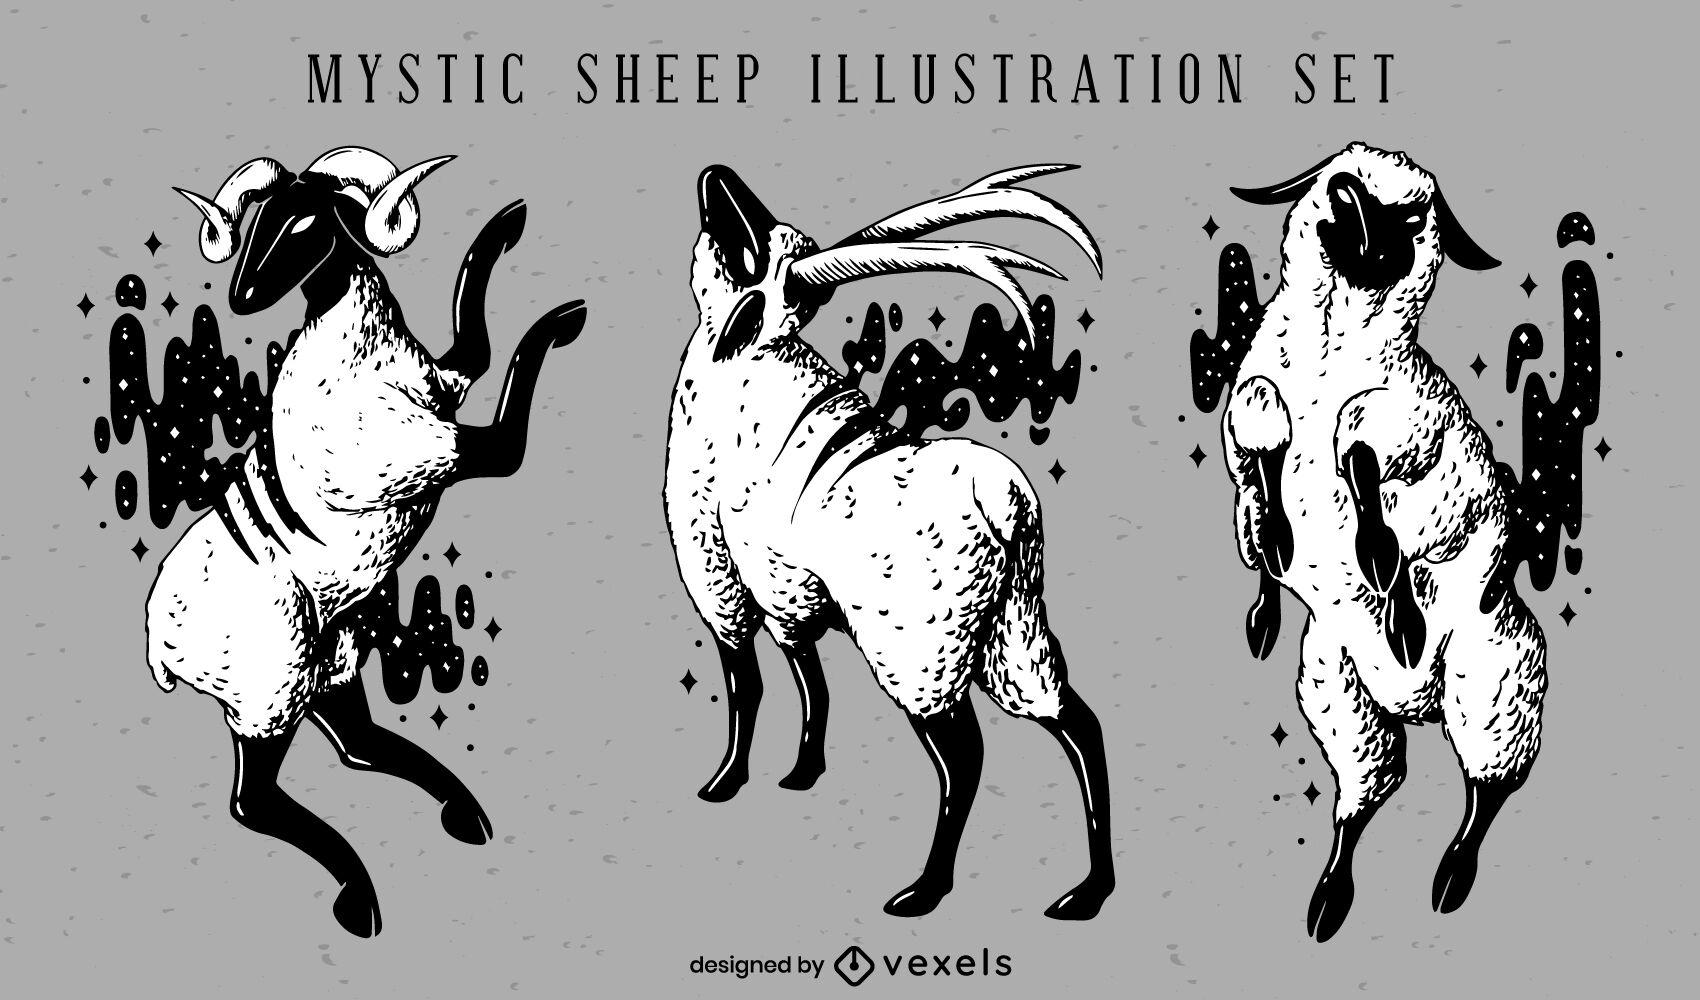 Magical sheeps animal illustration set